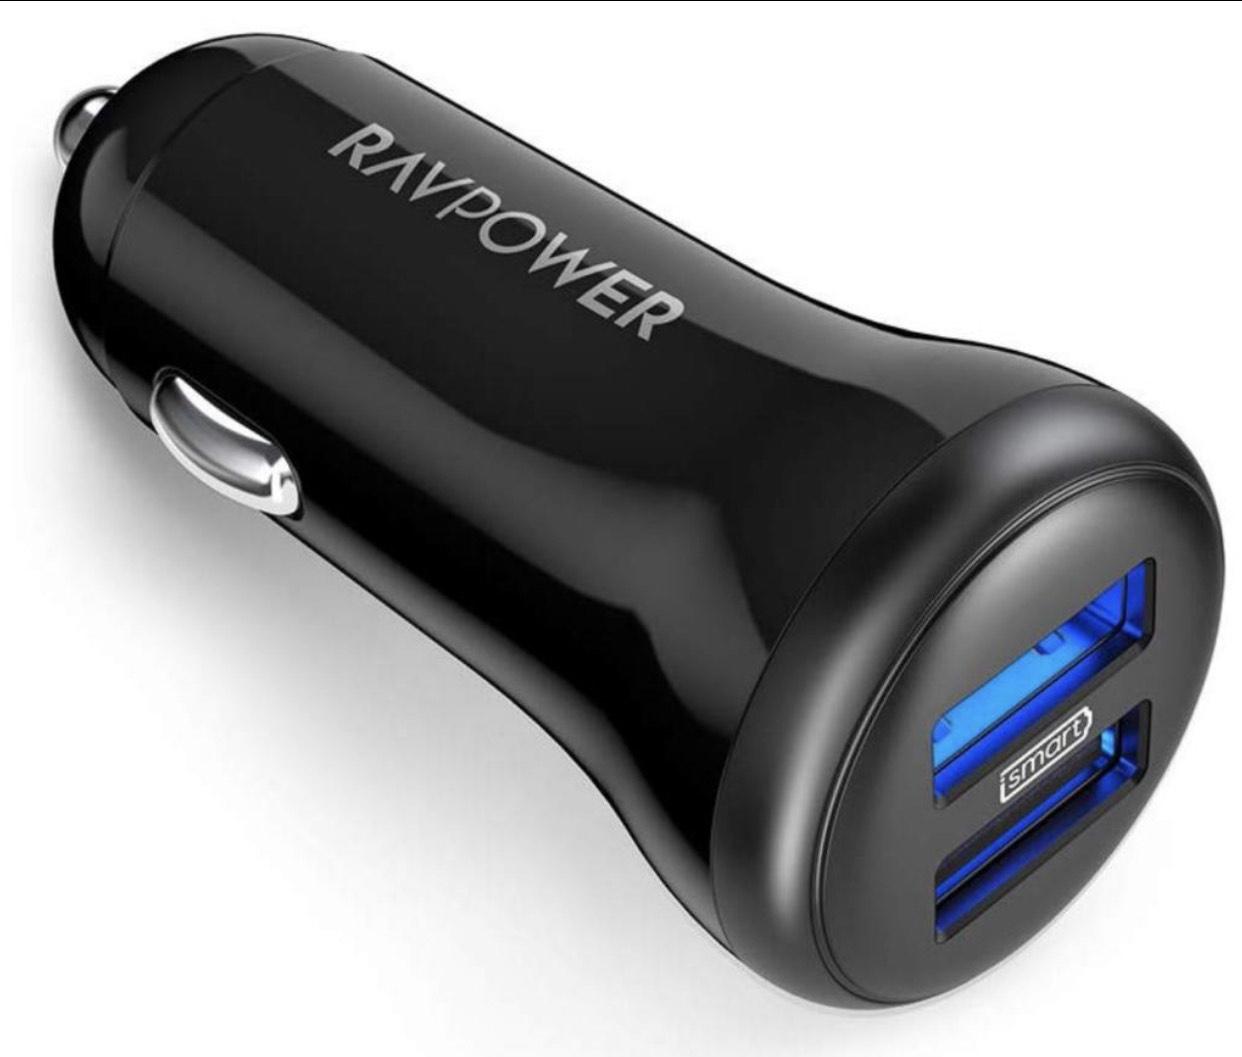 RAVPower 2-Port Auto Ladegerät 24W 5V/4.8A